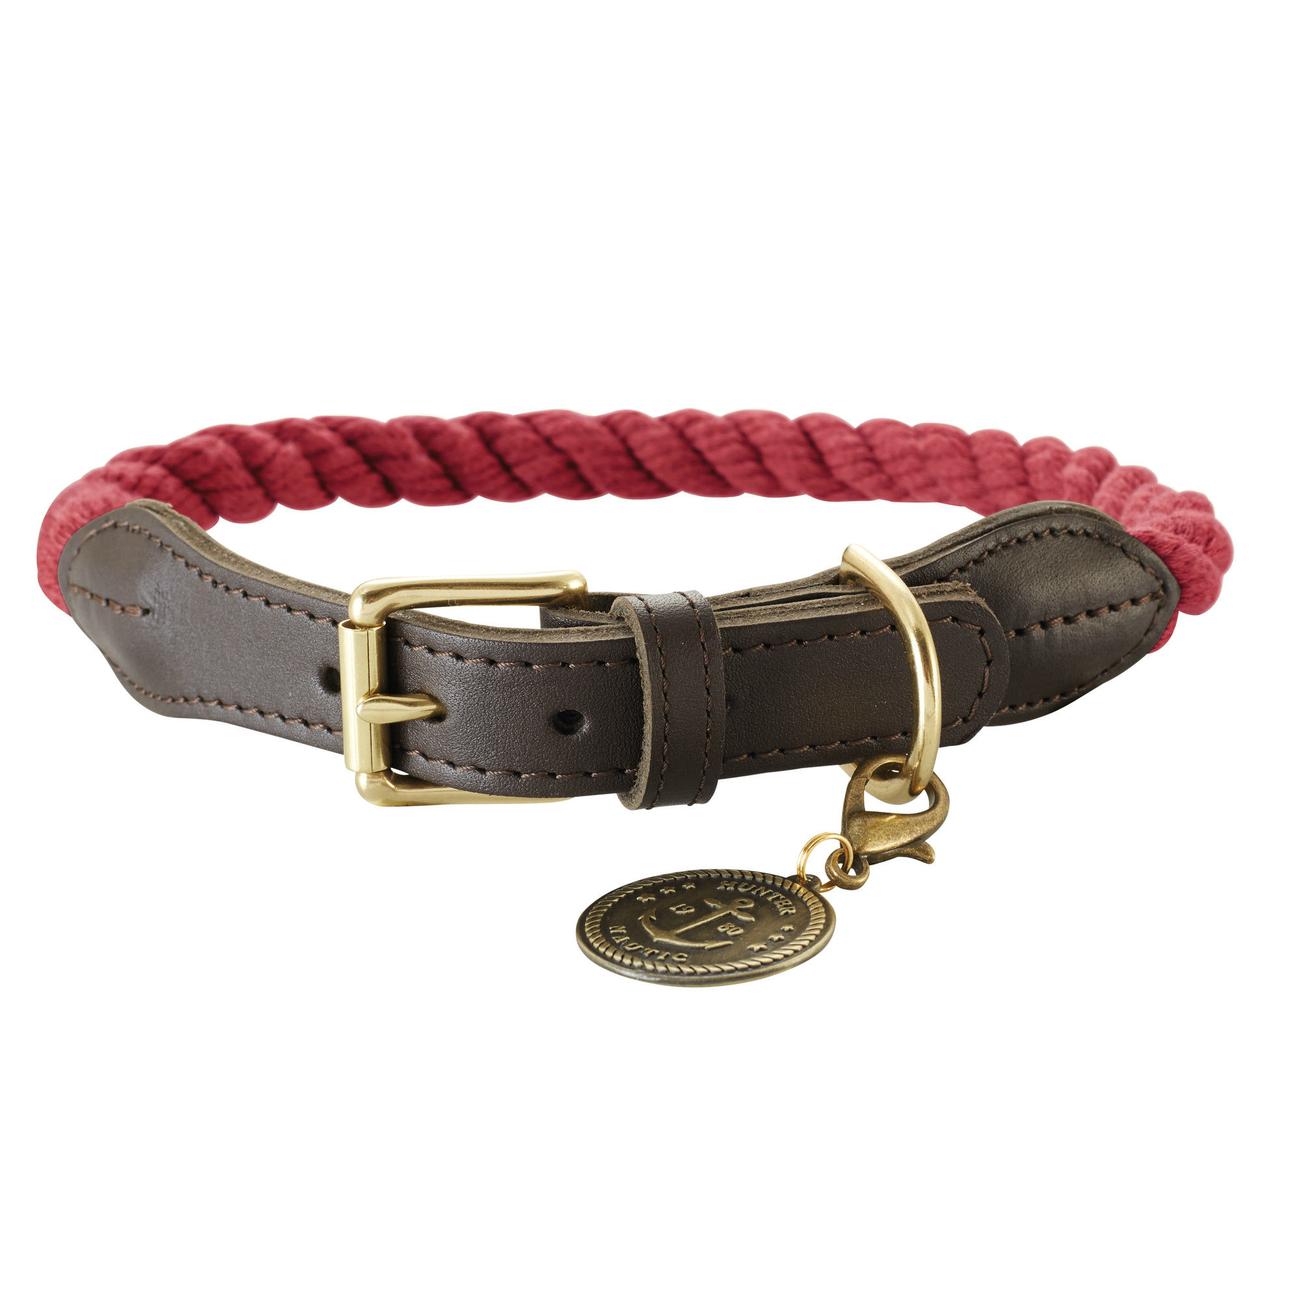 Hunter Hundehalsband List Tau 64715, Bild 3